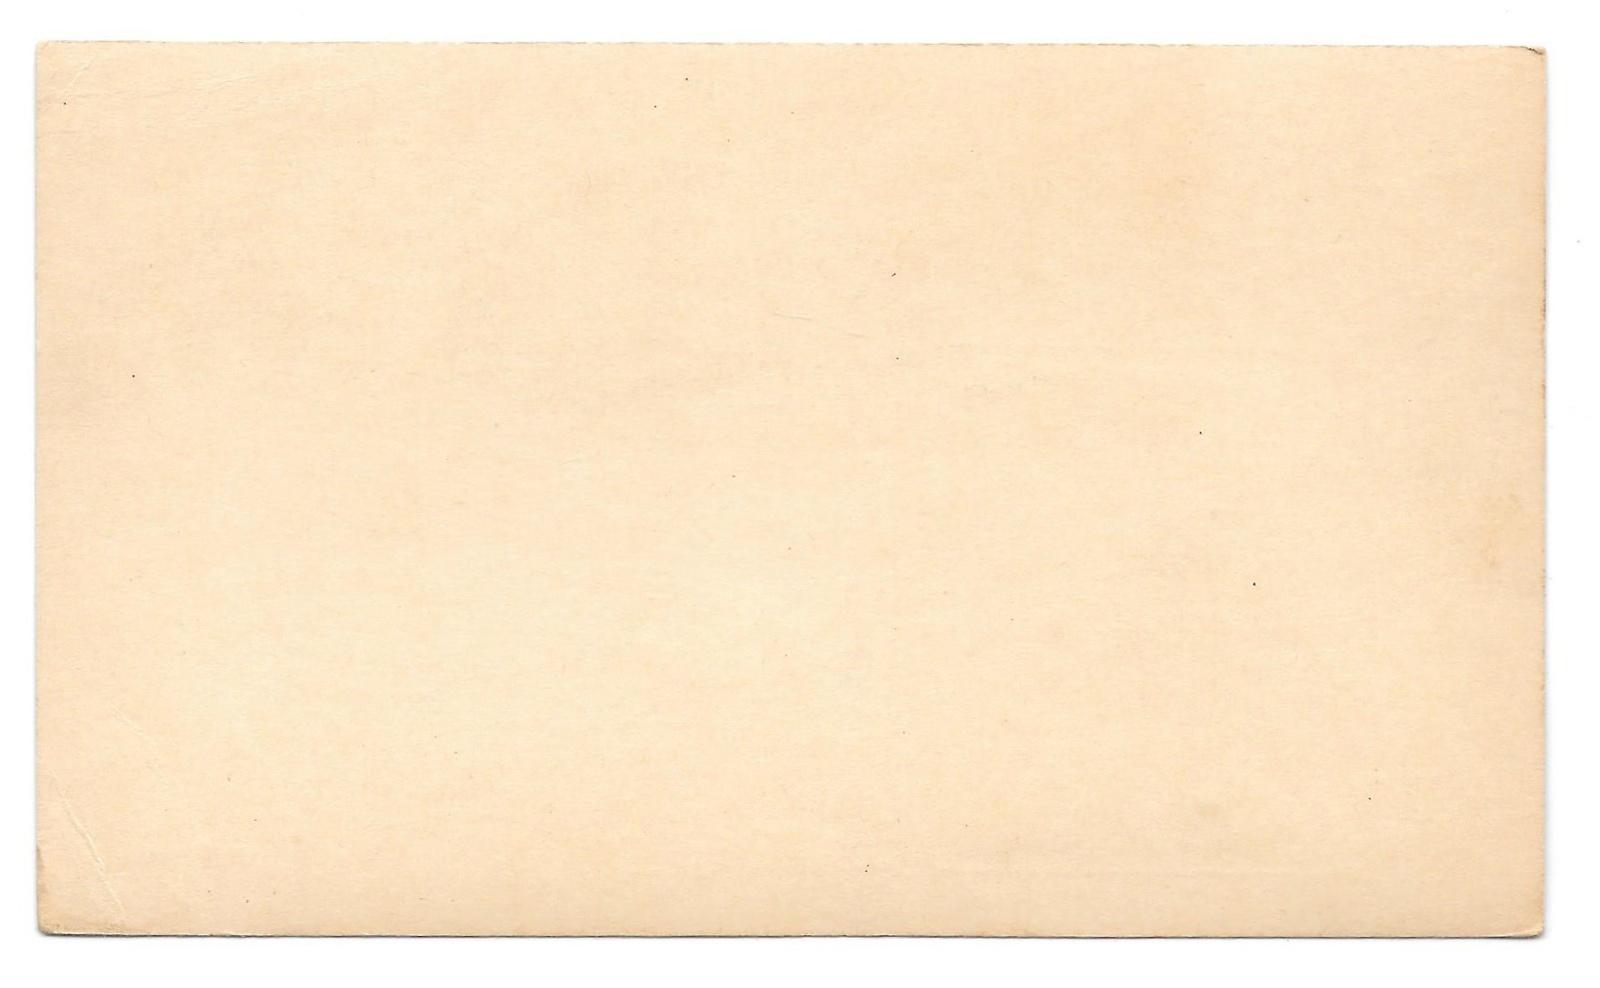 Navy Ship Cancel 1947 USS Glennon DD 840 CIPEX Poster Stamp Cinderela UX27